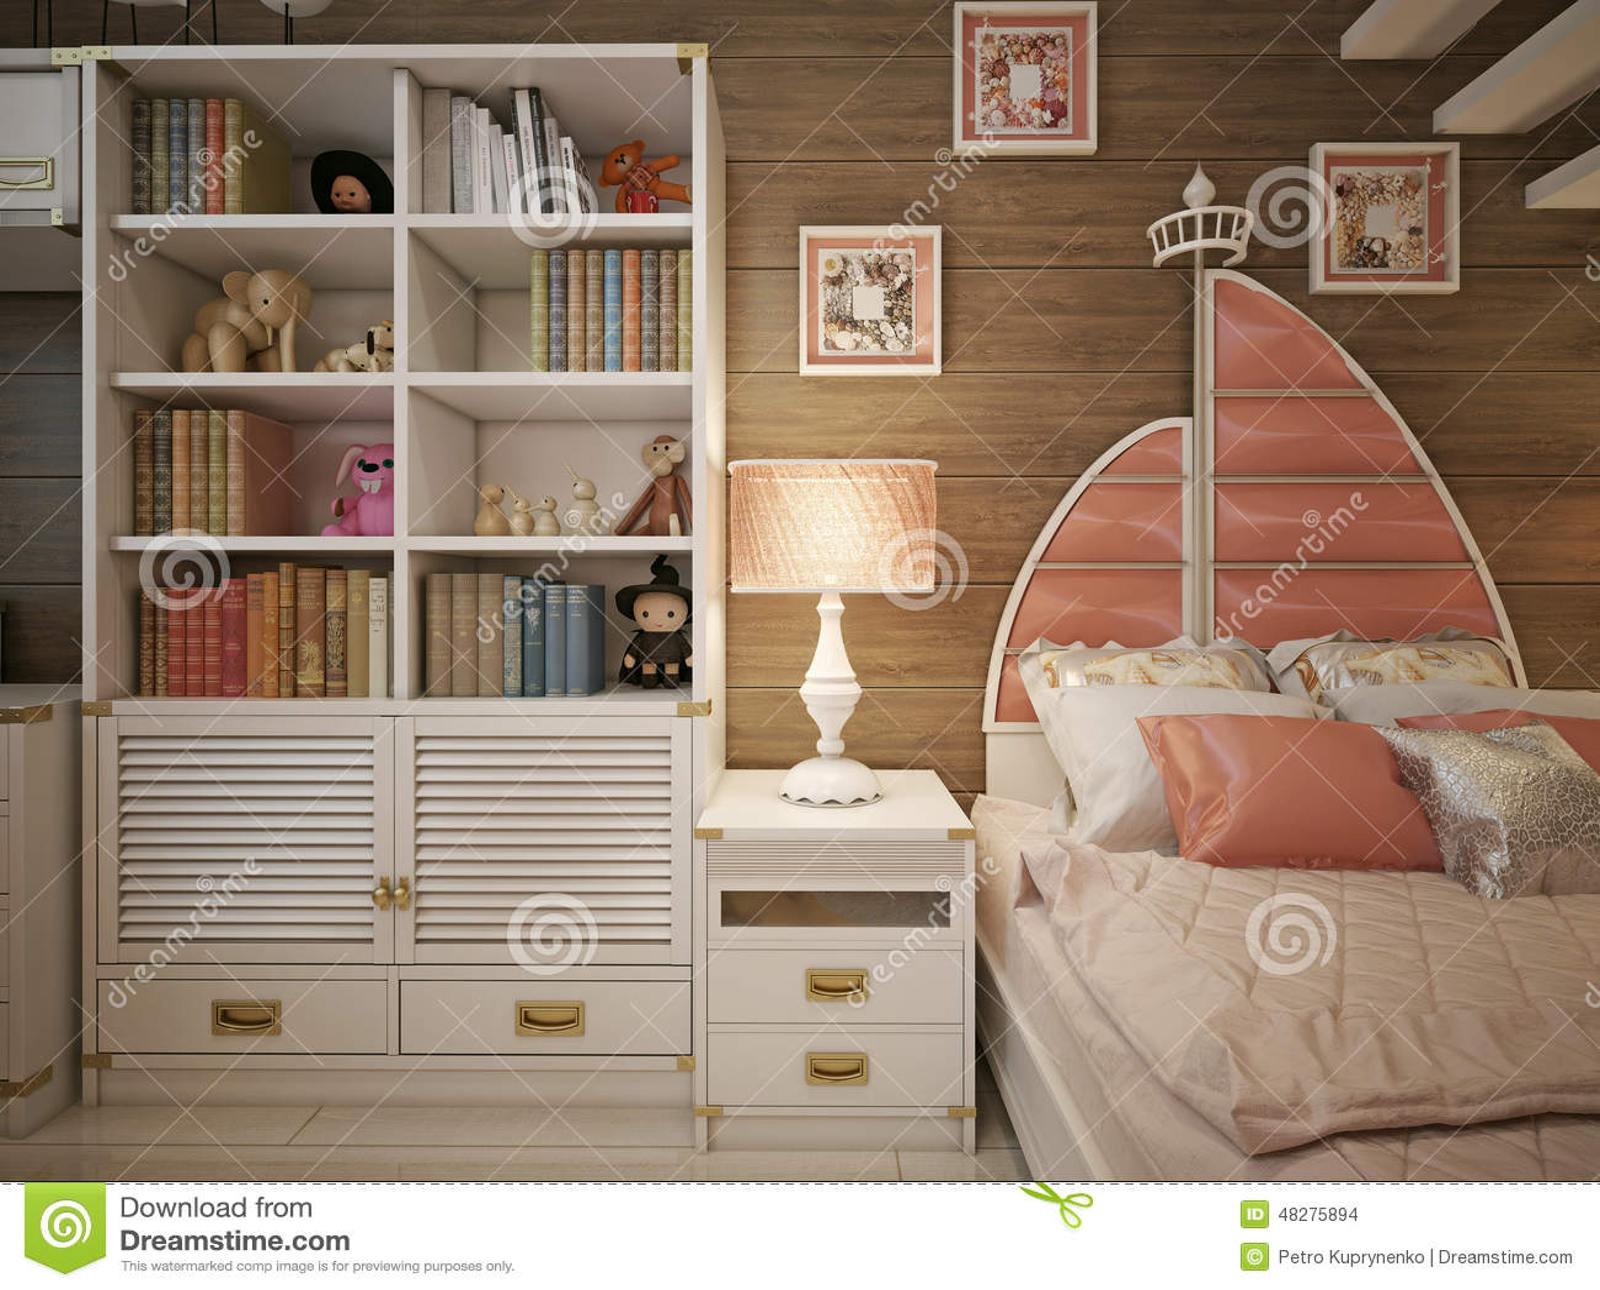 Meisjesslaapkamer in klassieke stijl stock illustratie